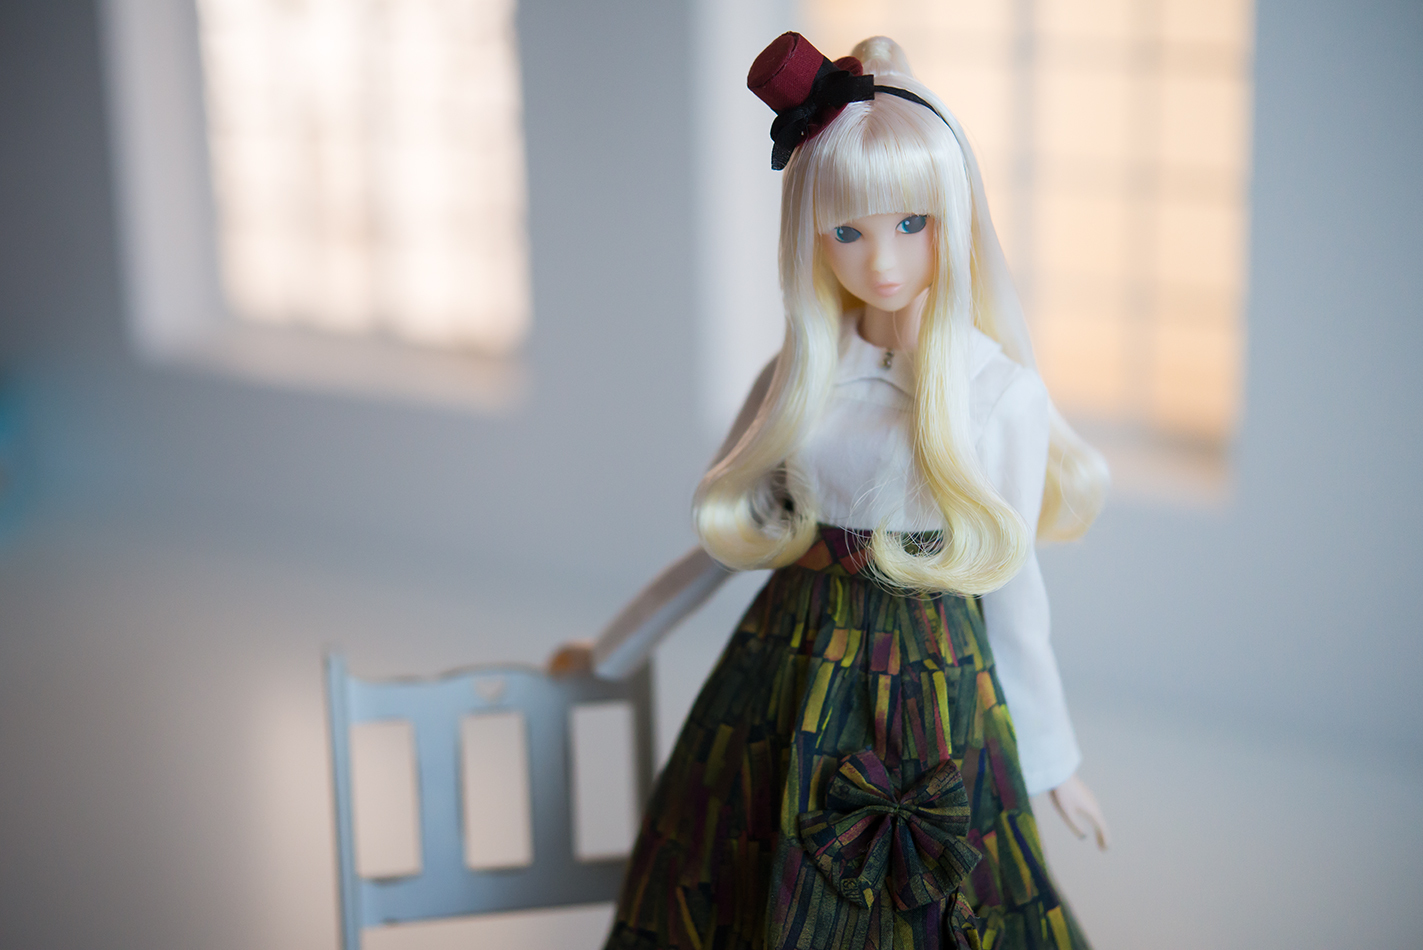 Today's momoko 1701